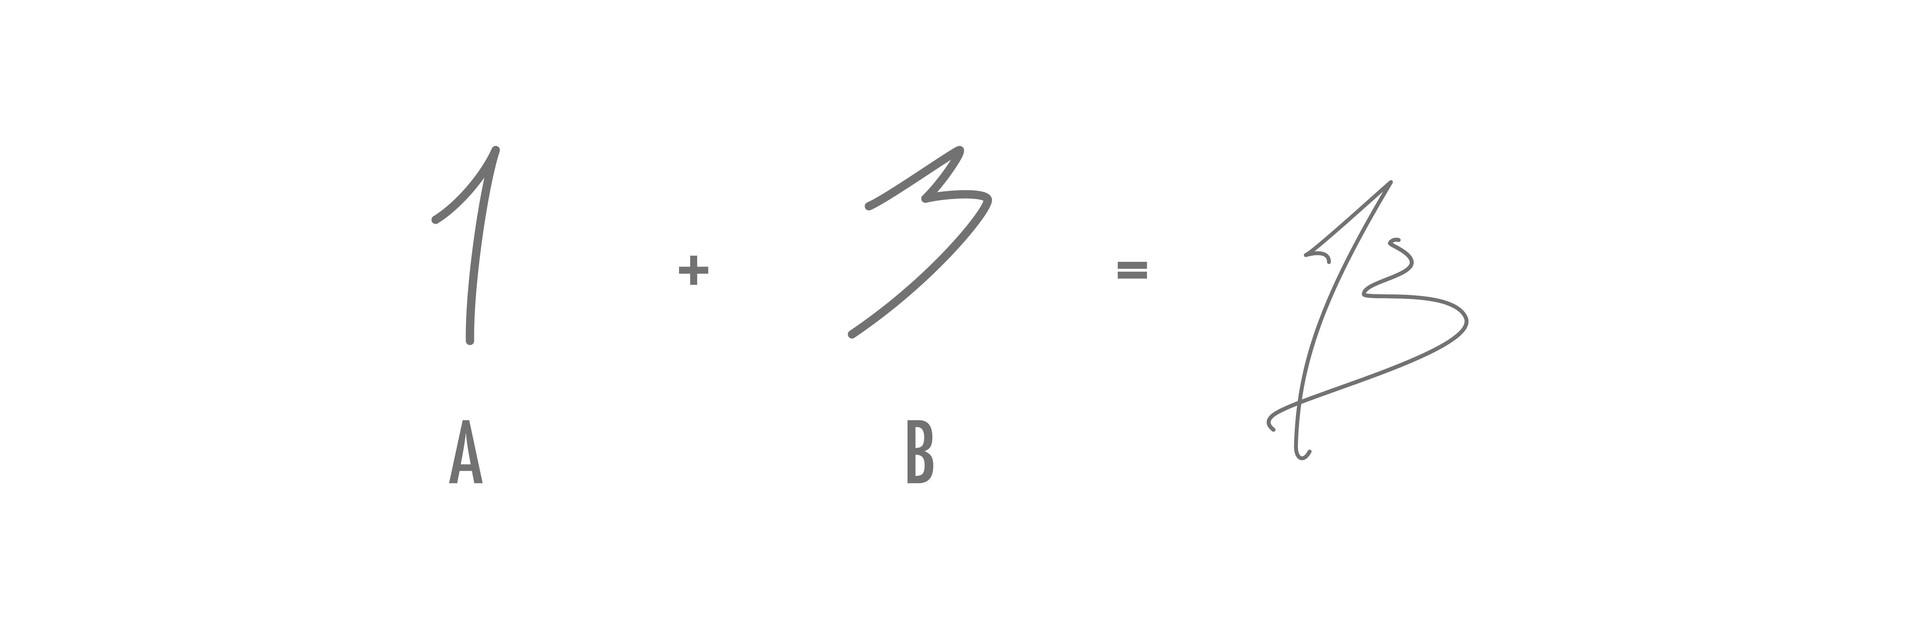 bruna-simbolo.jpg